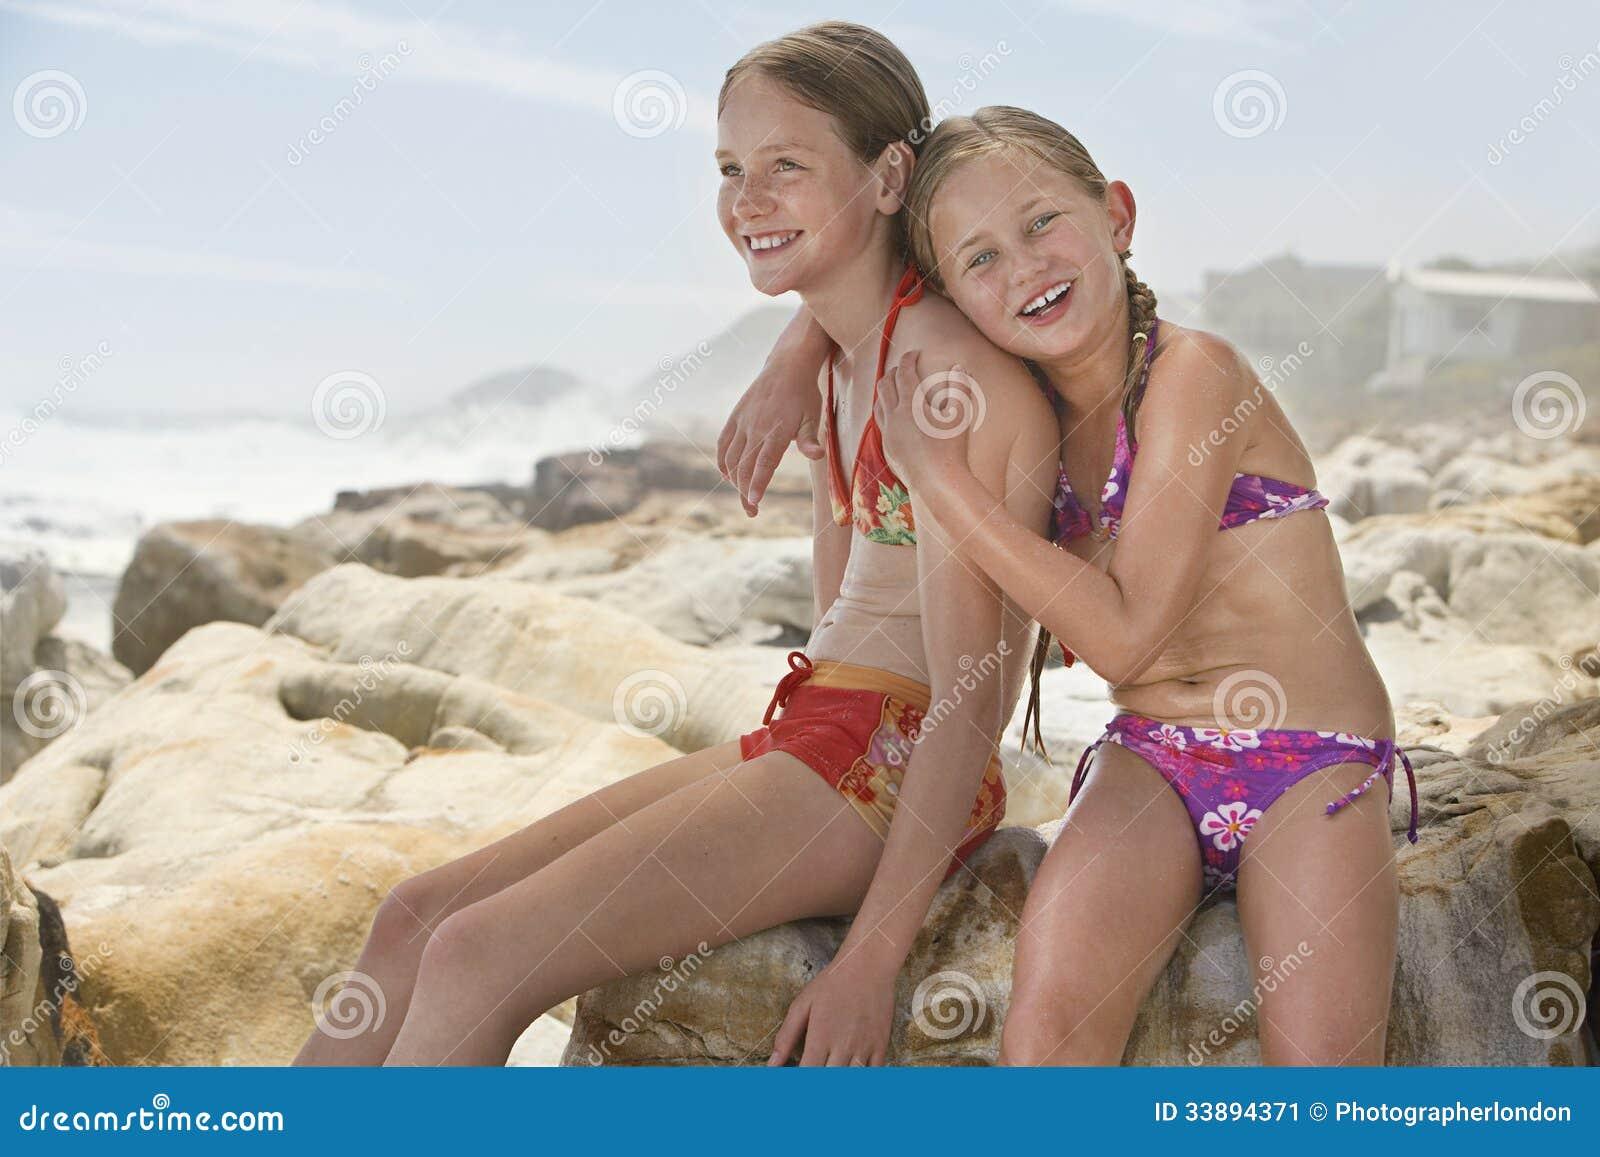 Picnudeandseminudefanstaywomen net pron interracial teens